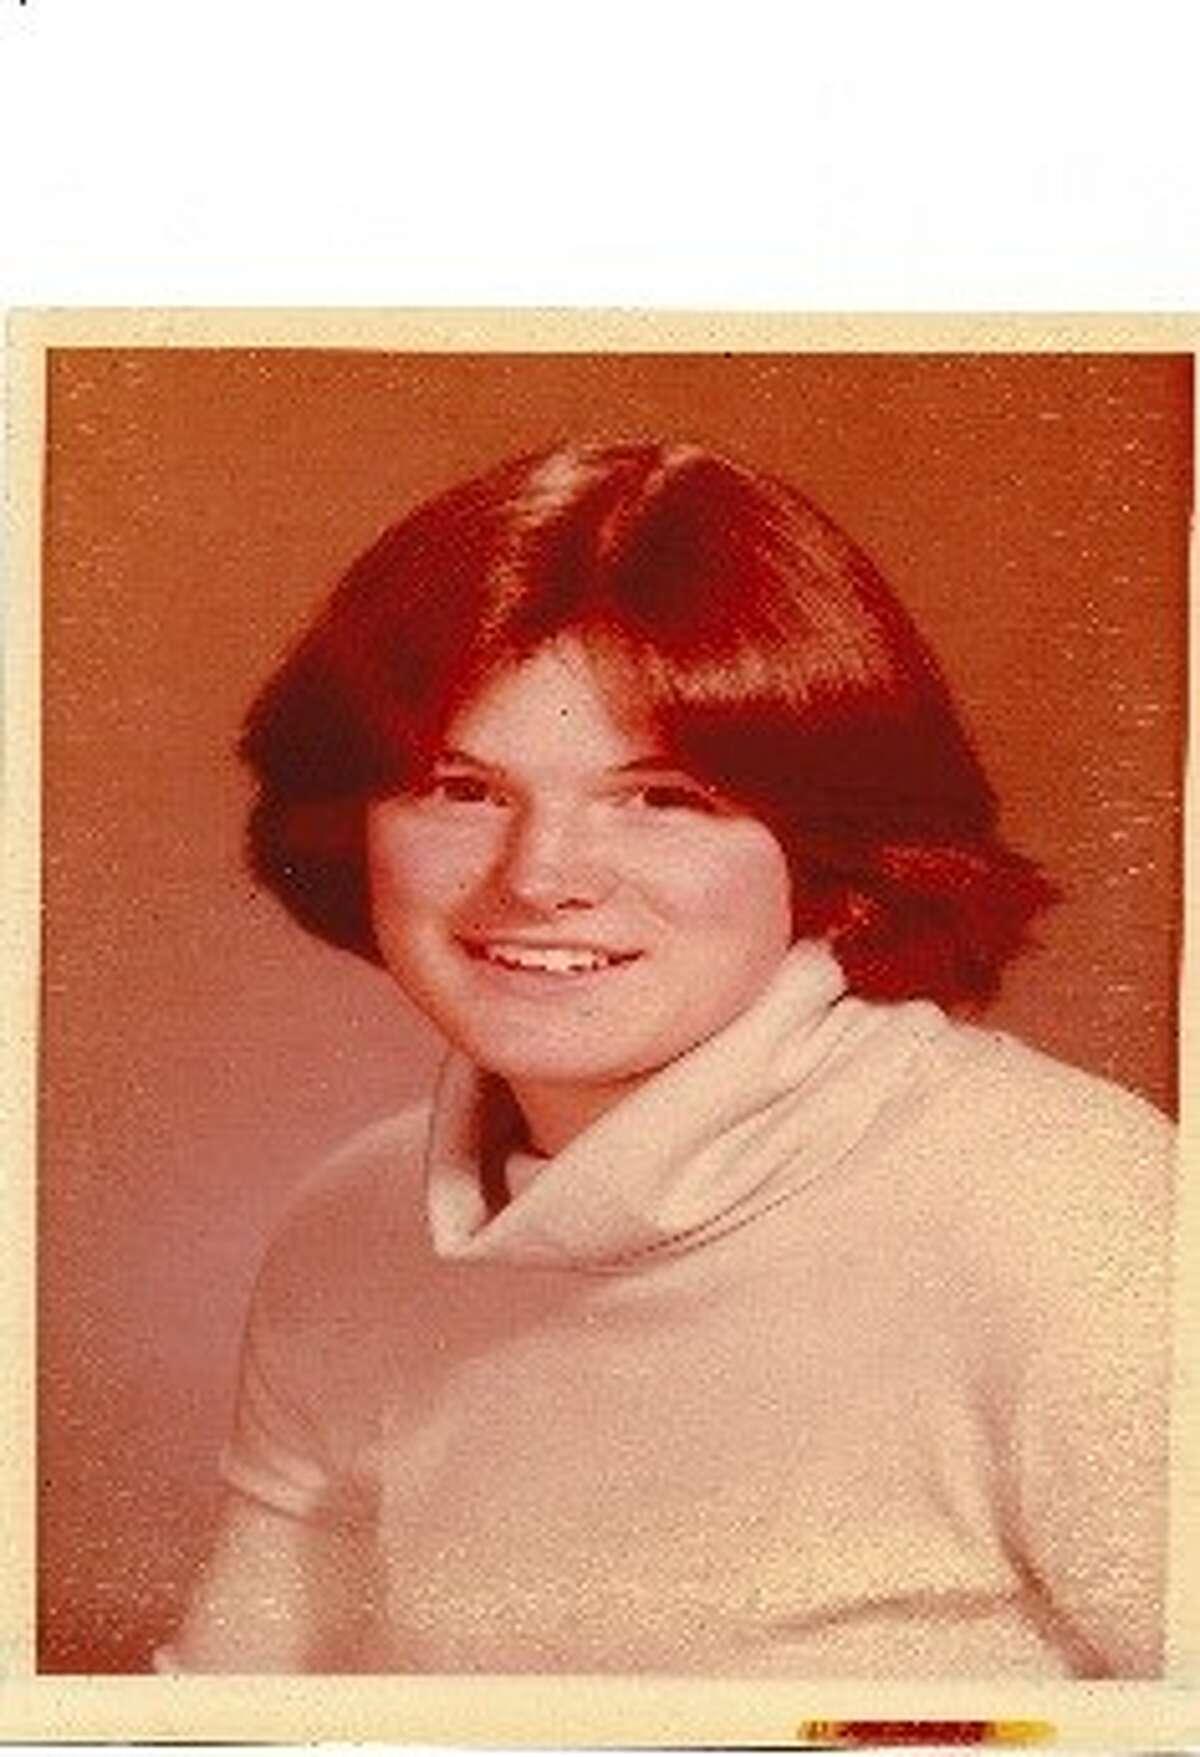 Liz Pulie of Barlow's Class of 1979.